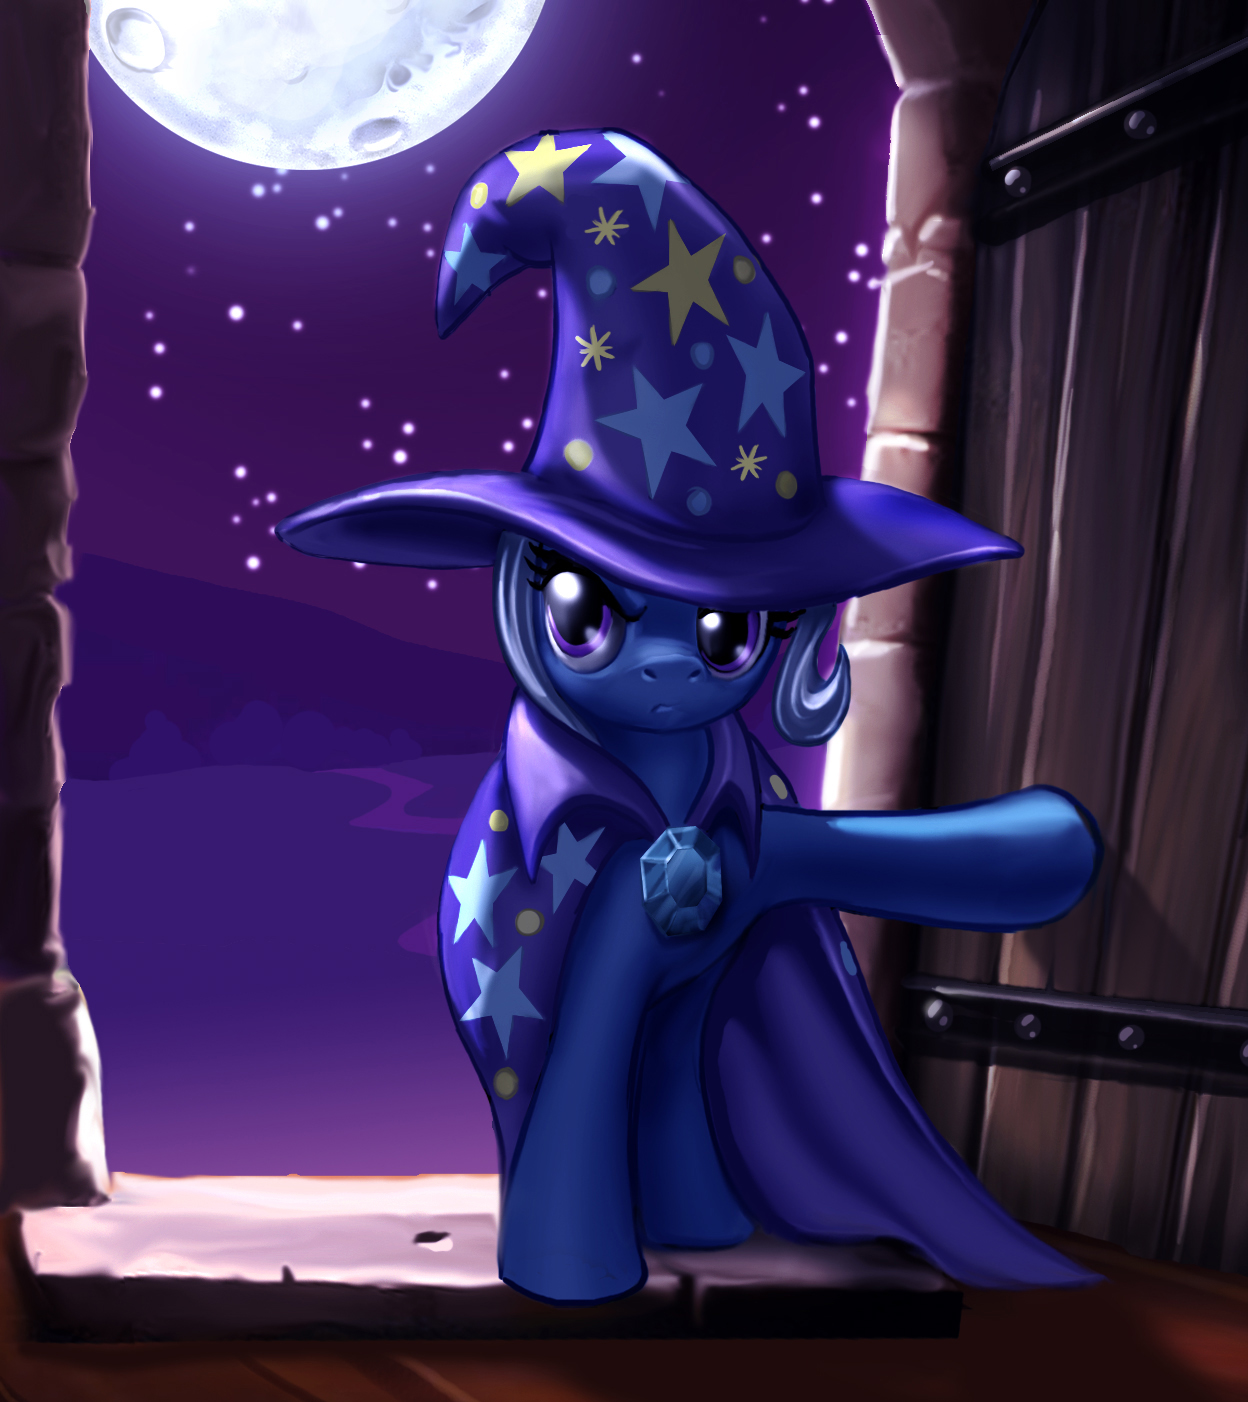 A Wild Trixie Appears by harwicks-art